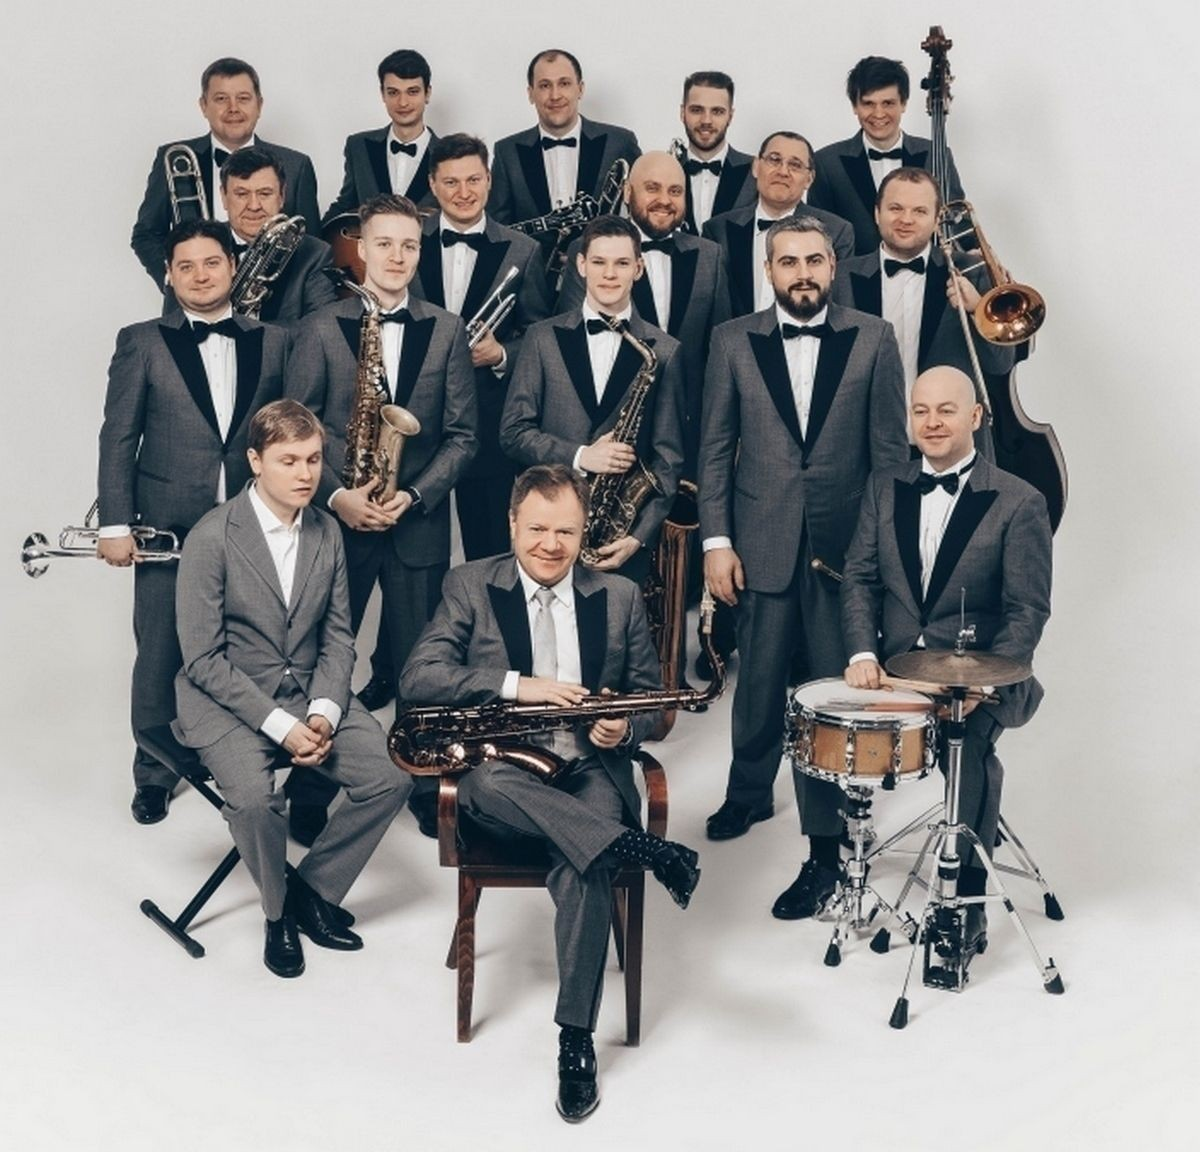 Джазовый оркестр фото картинки